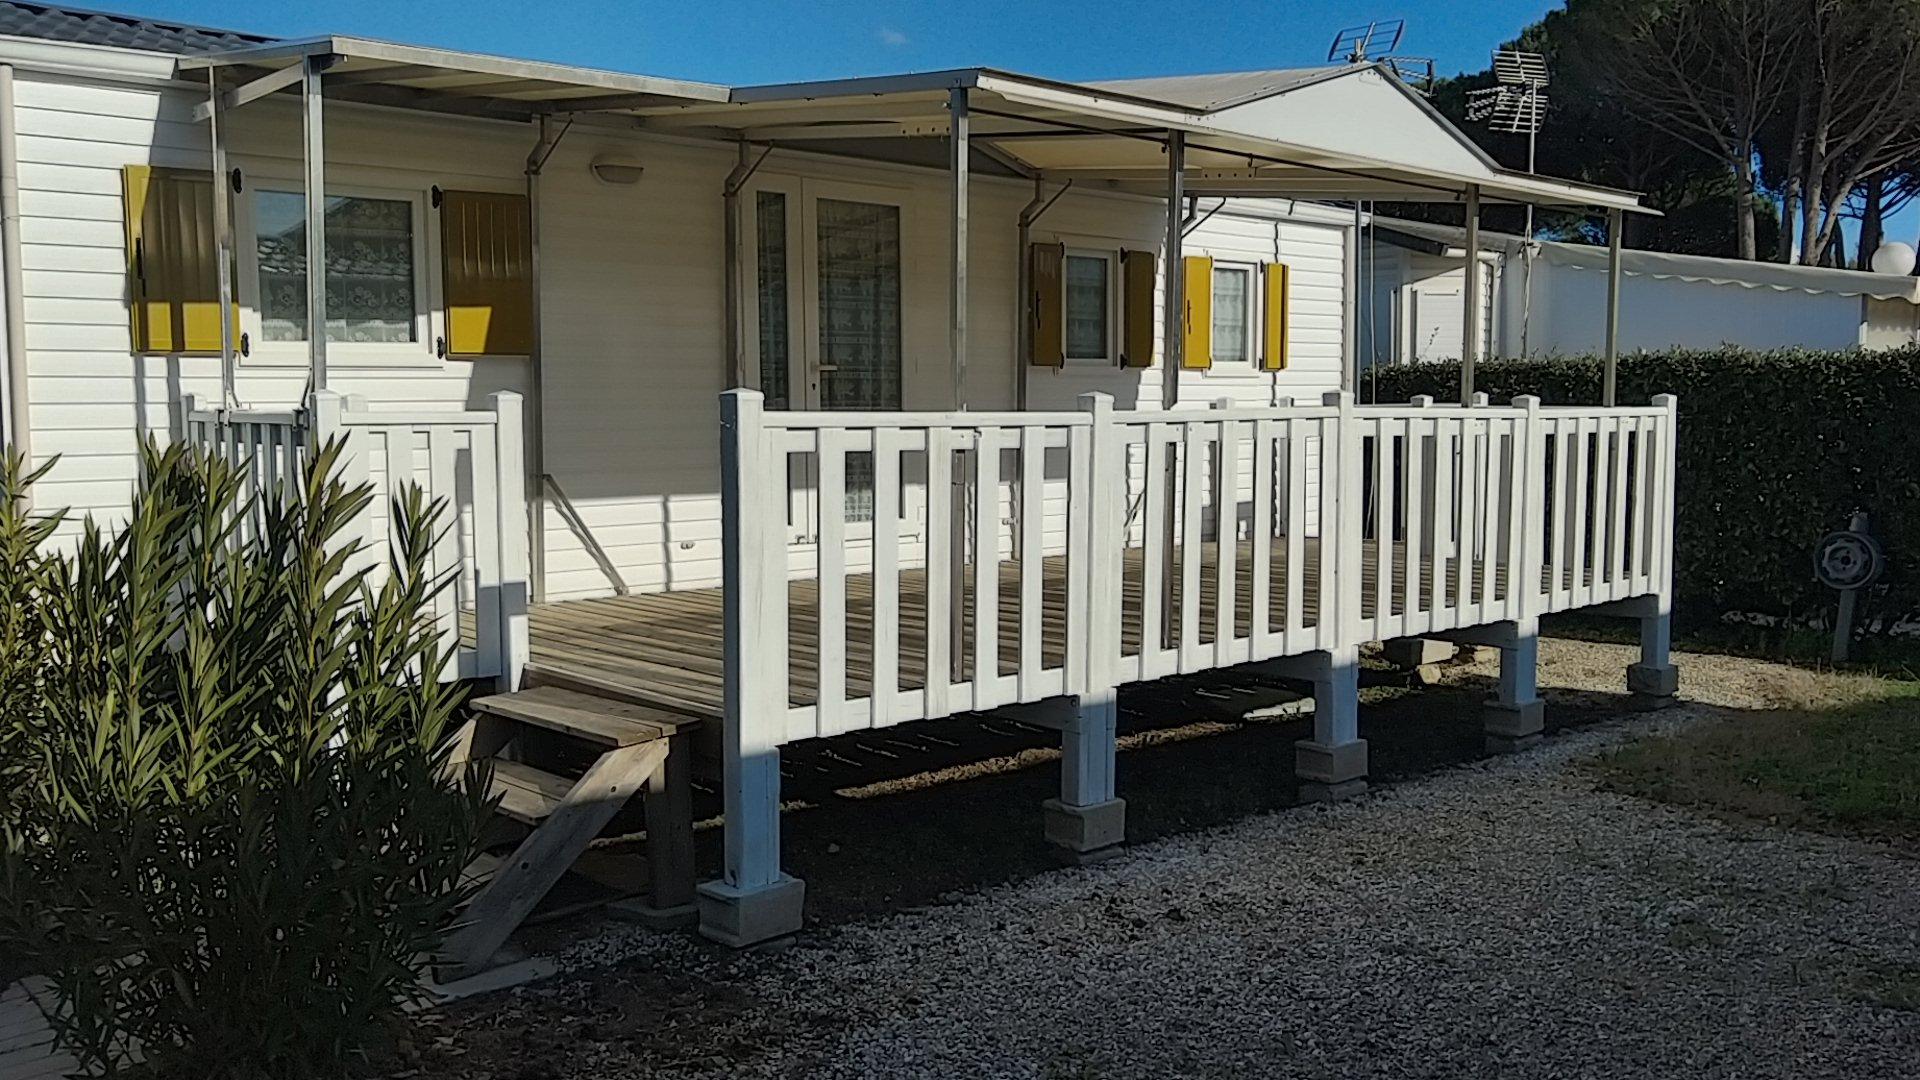 Location - Mobil-Home Shelbox 4 Pers. - Camping de Vaudois